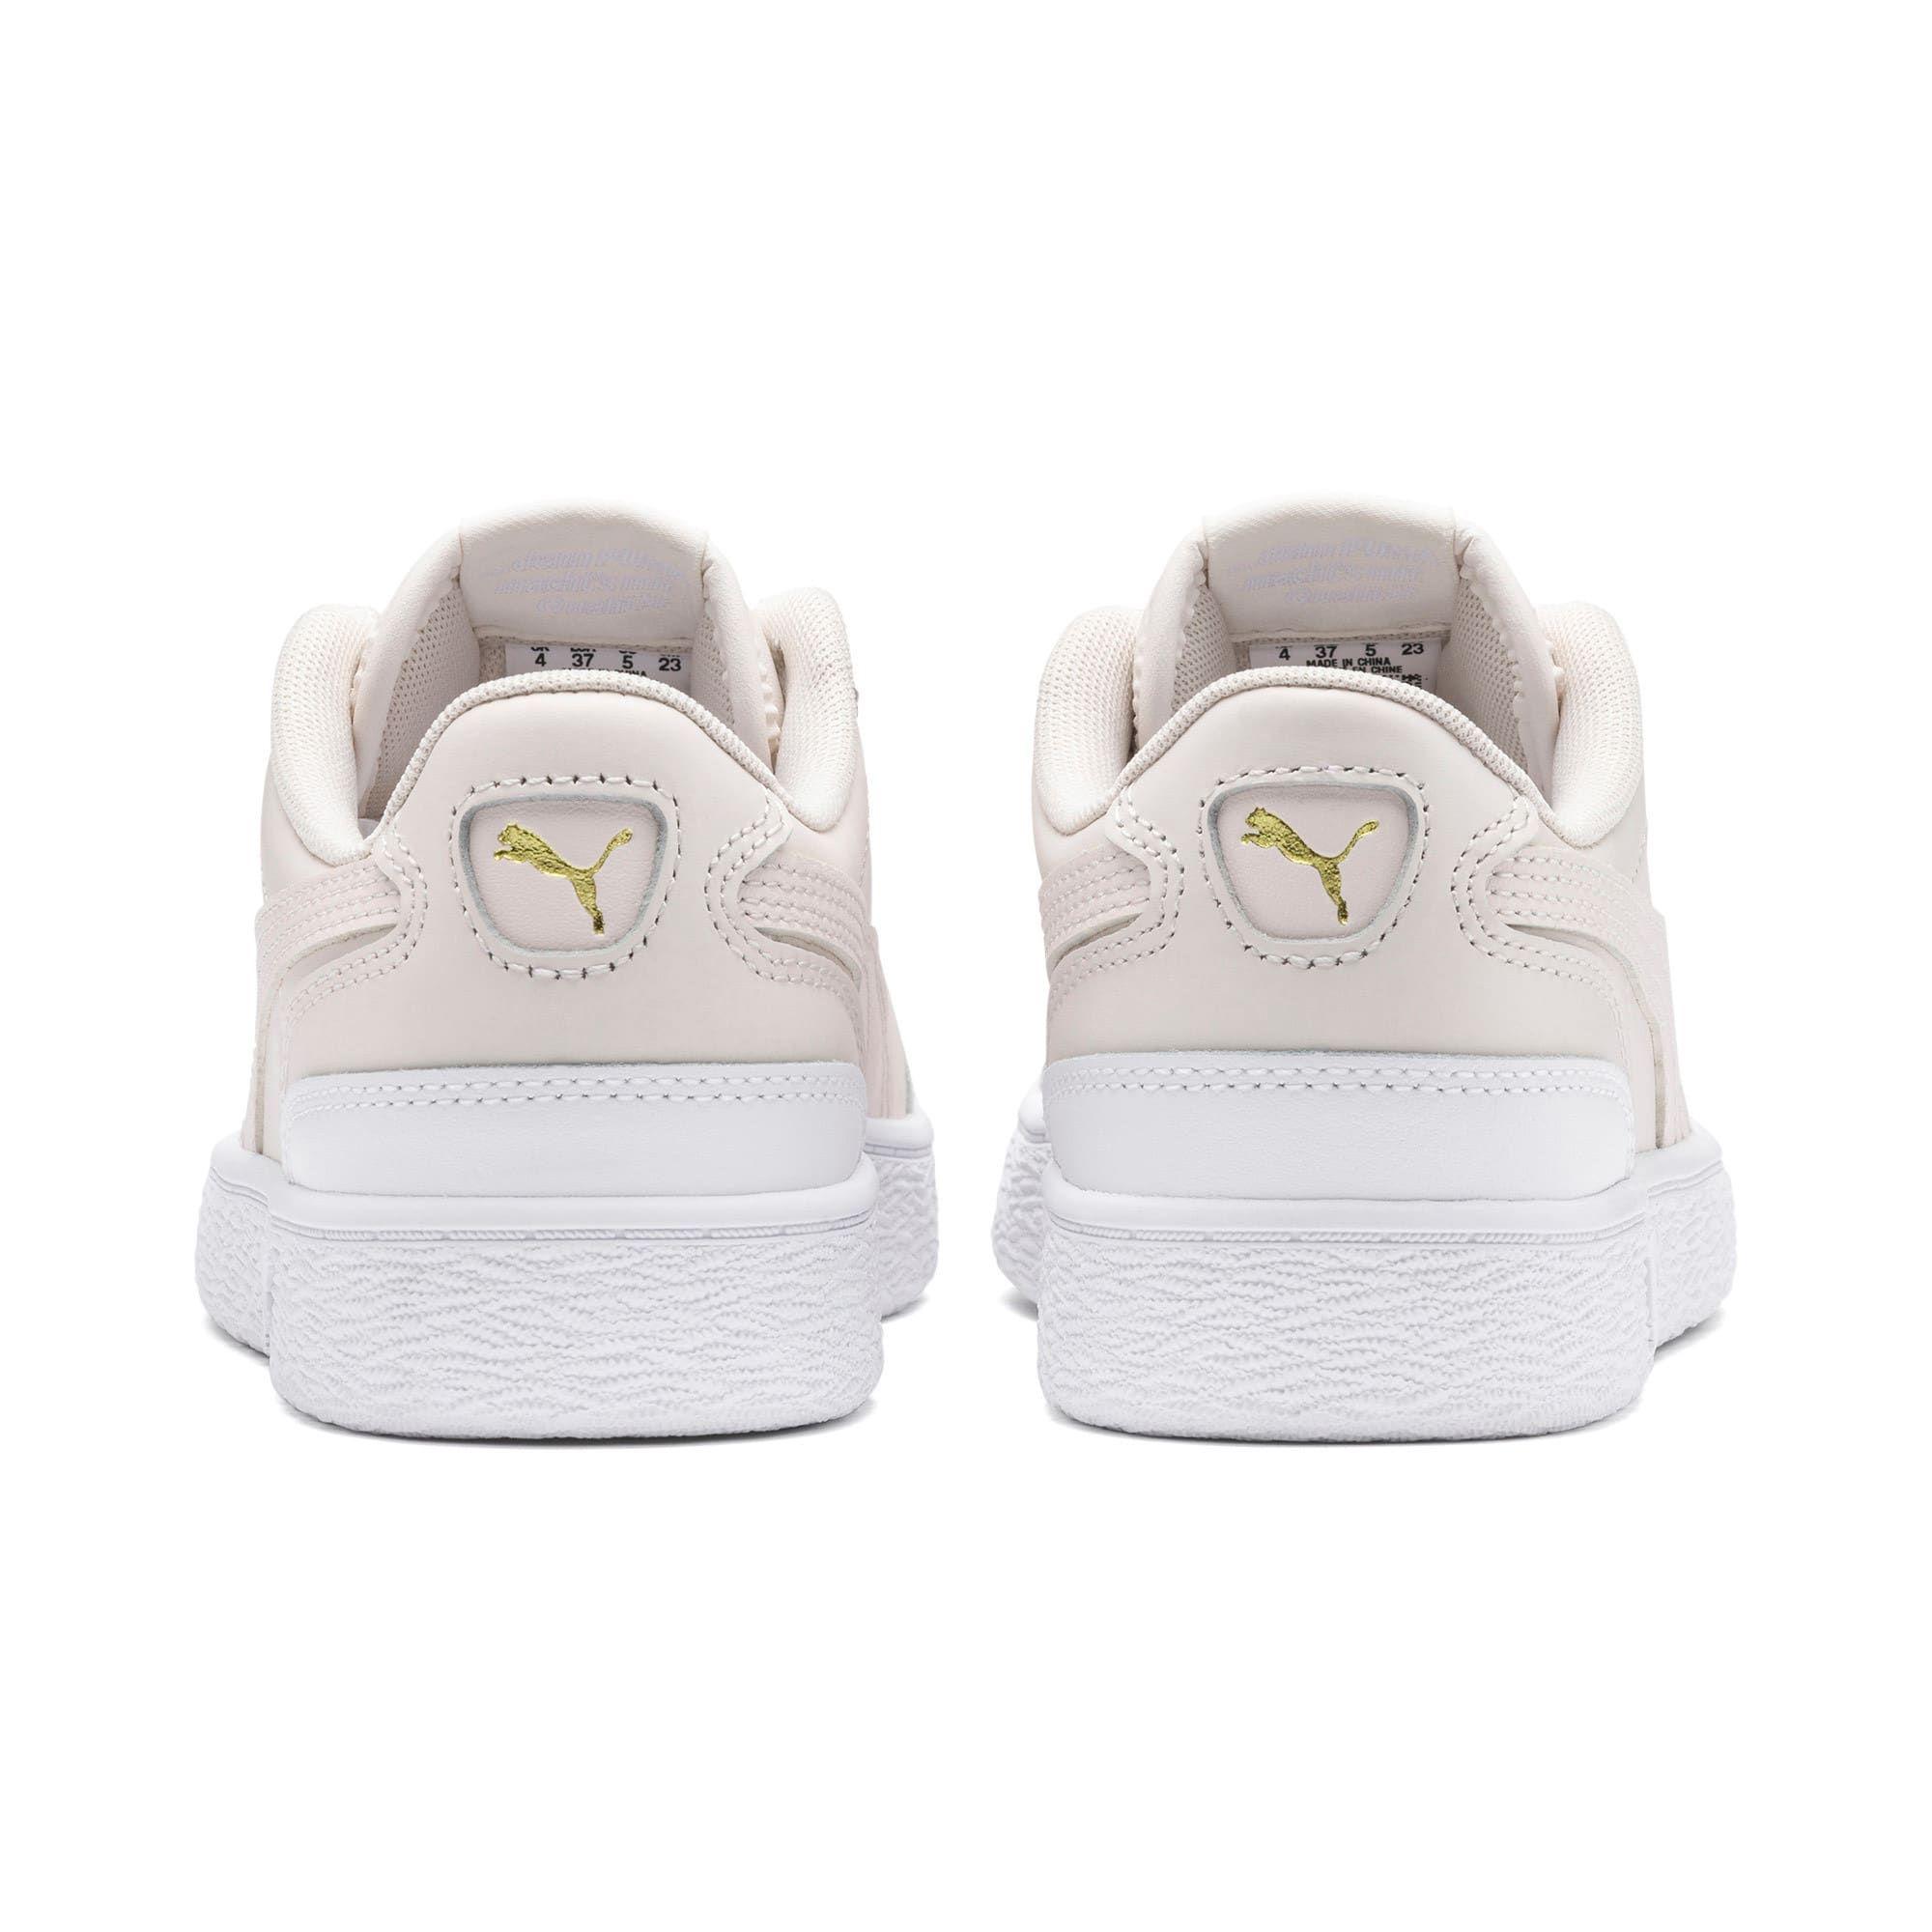 Men's PUMA Ralph Sampson Lo Trainers, Pastel/Pastel/White, size 6, Shoes